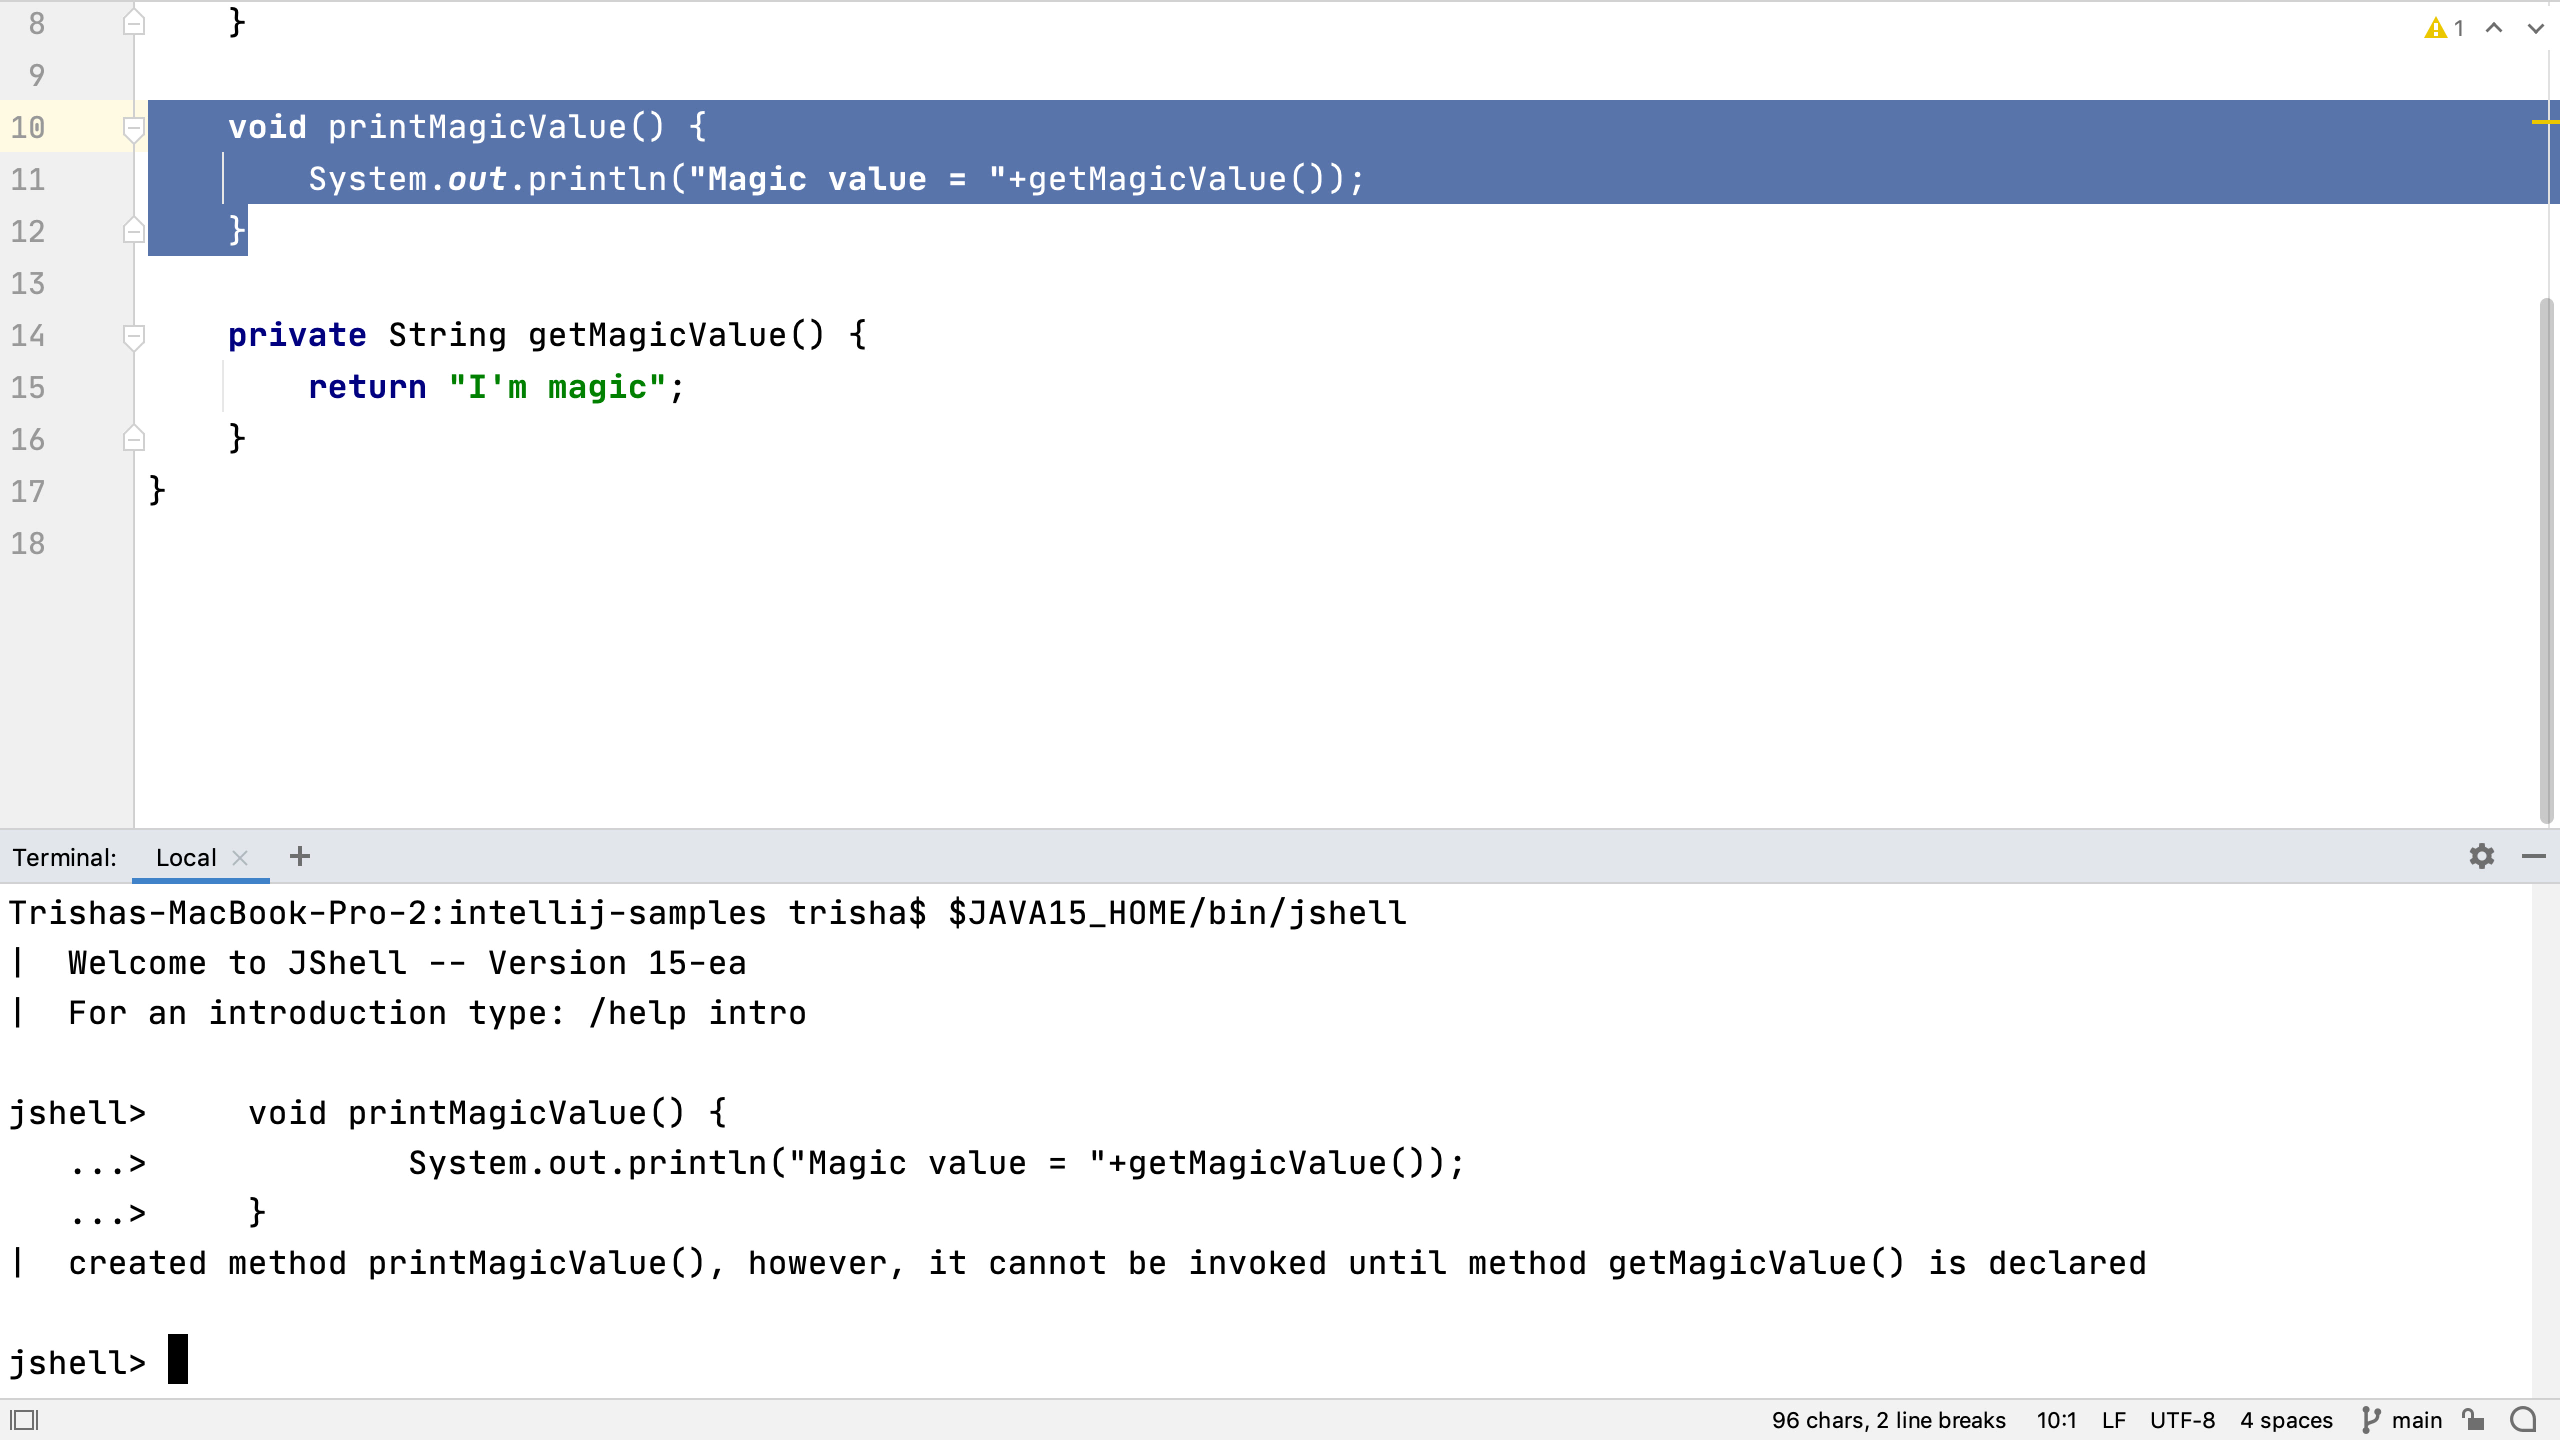 Pasting code